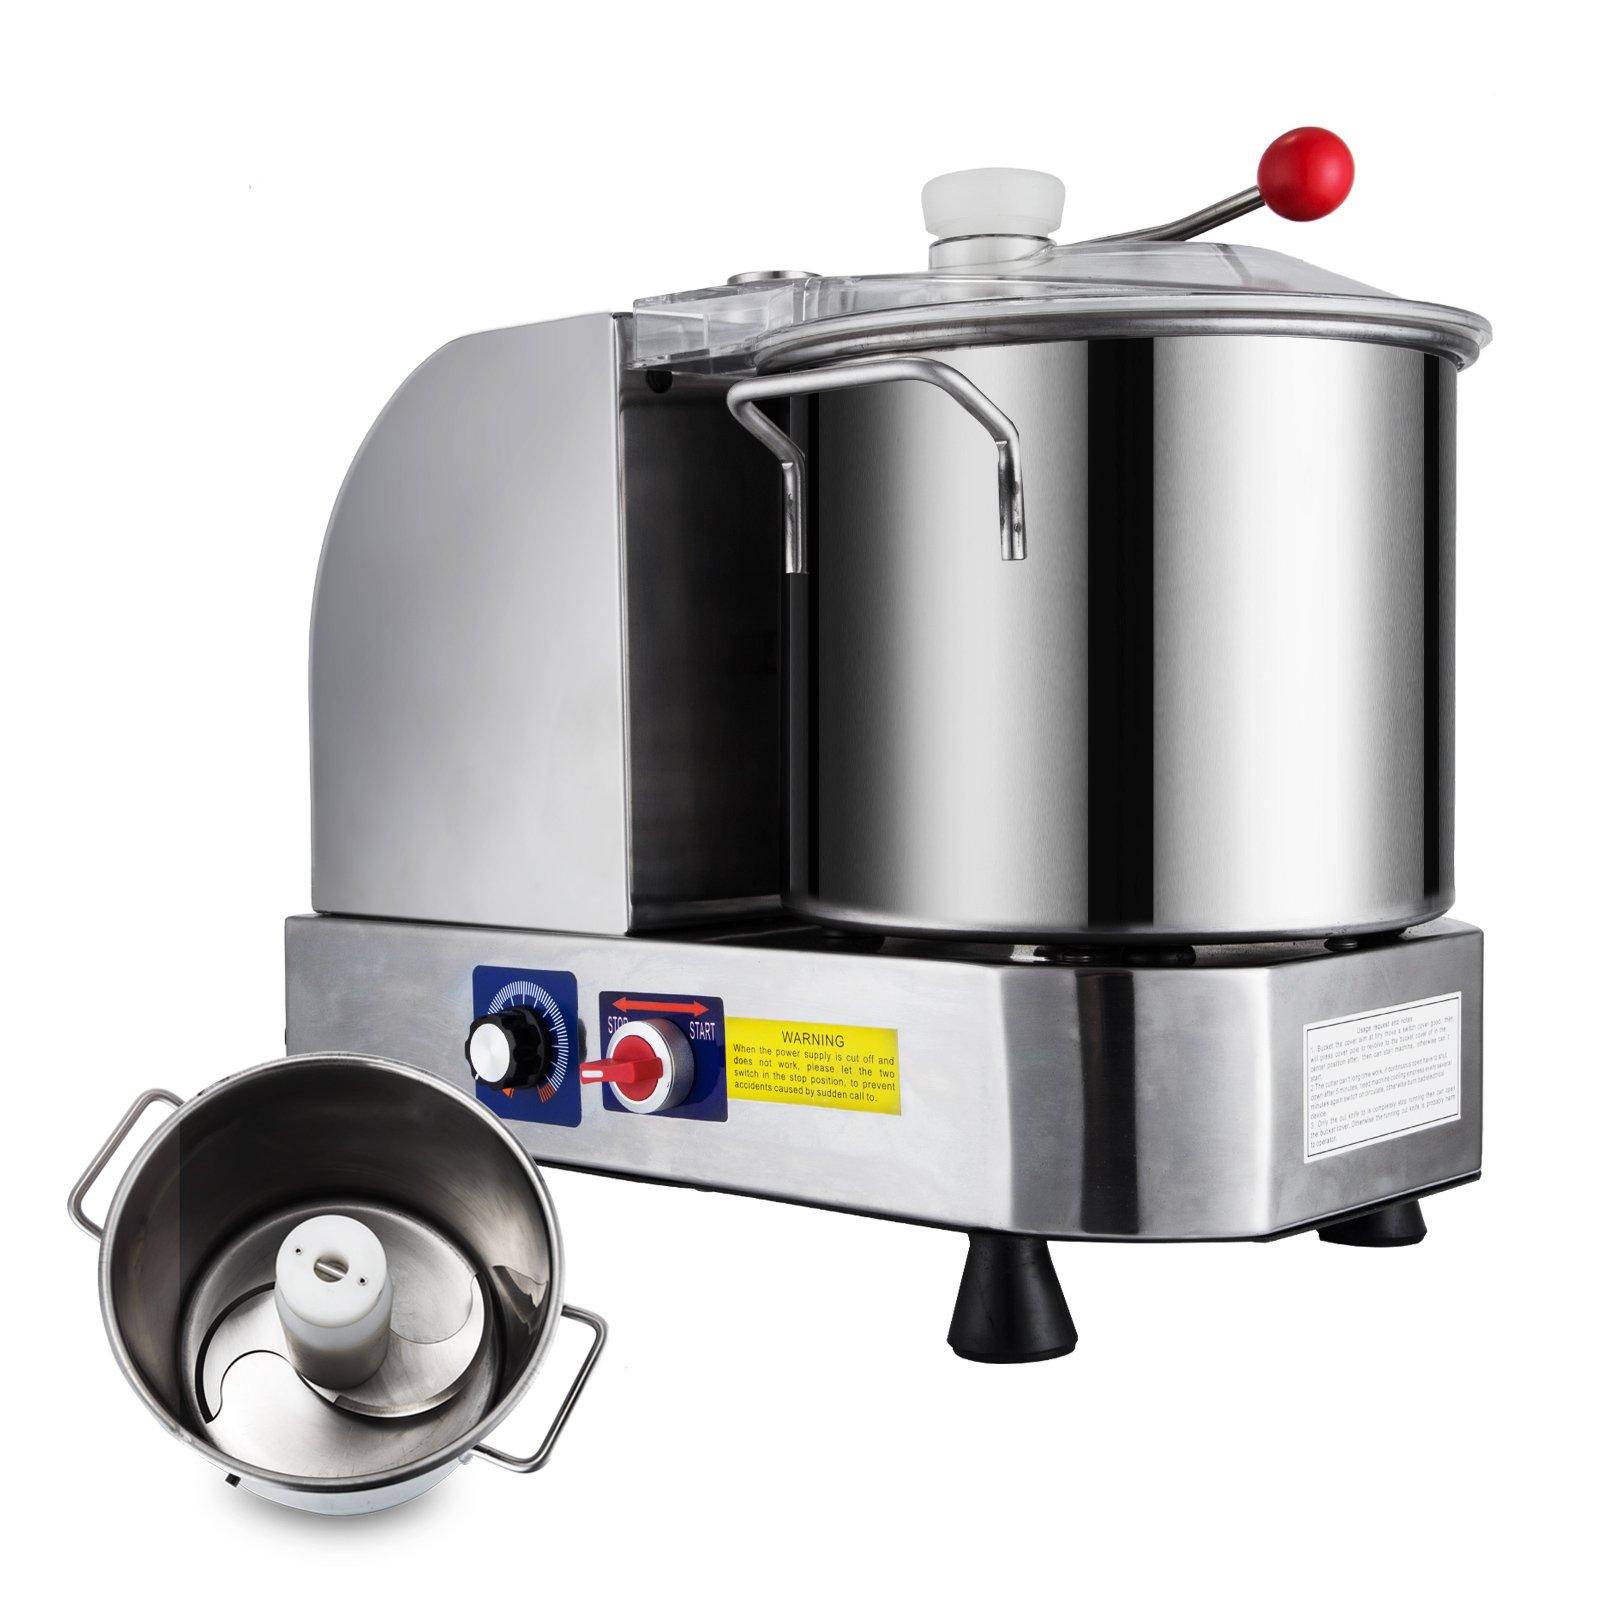 Happybuy Food Cutter Mixer 9L Food Grinder Processor 850/2000 RPM Food Grinder Commercial for Meat Vegetables and Fruit (9L)